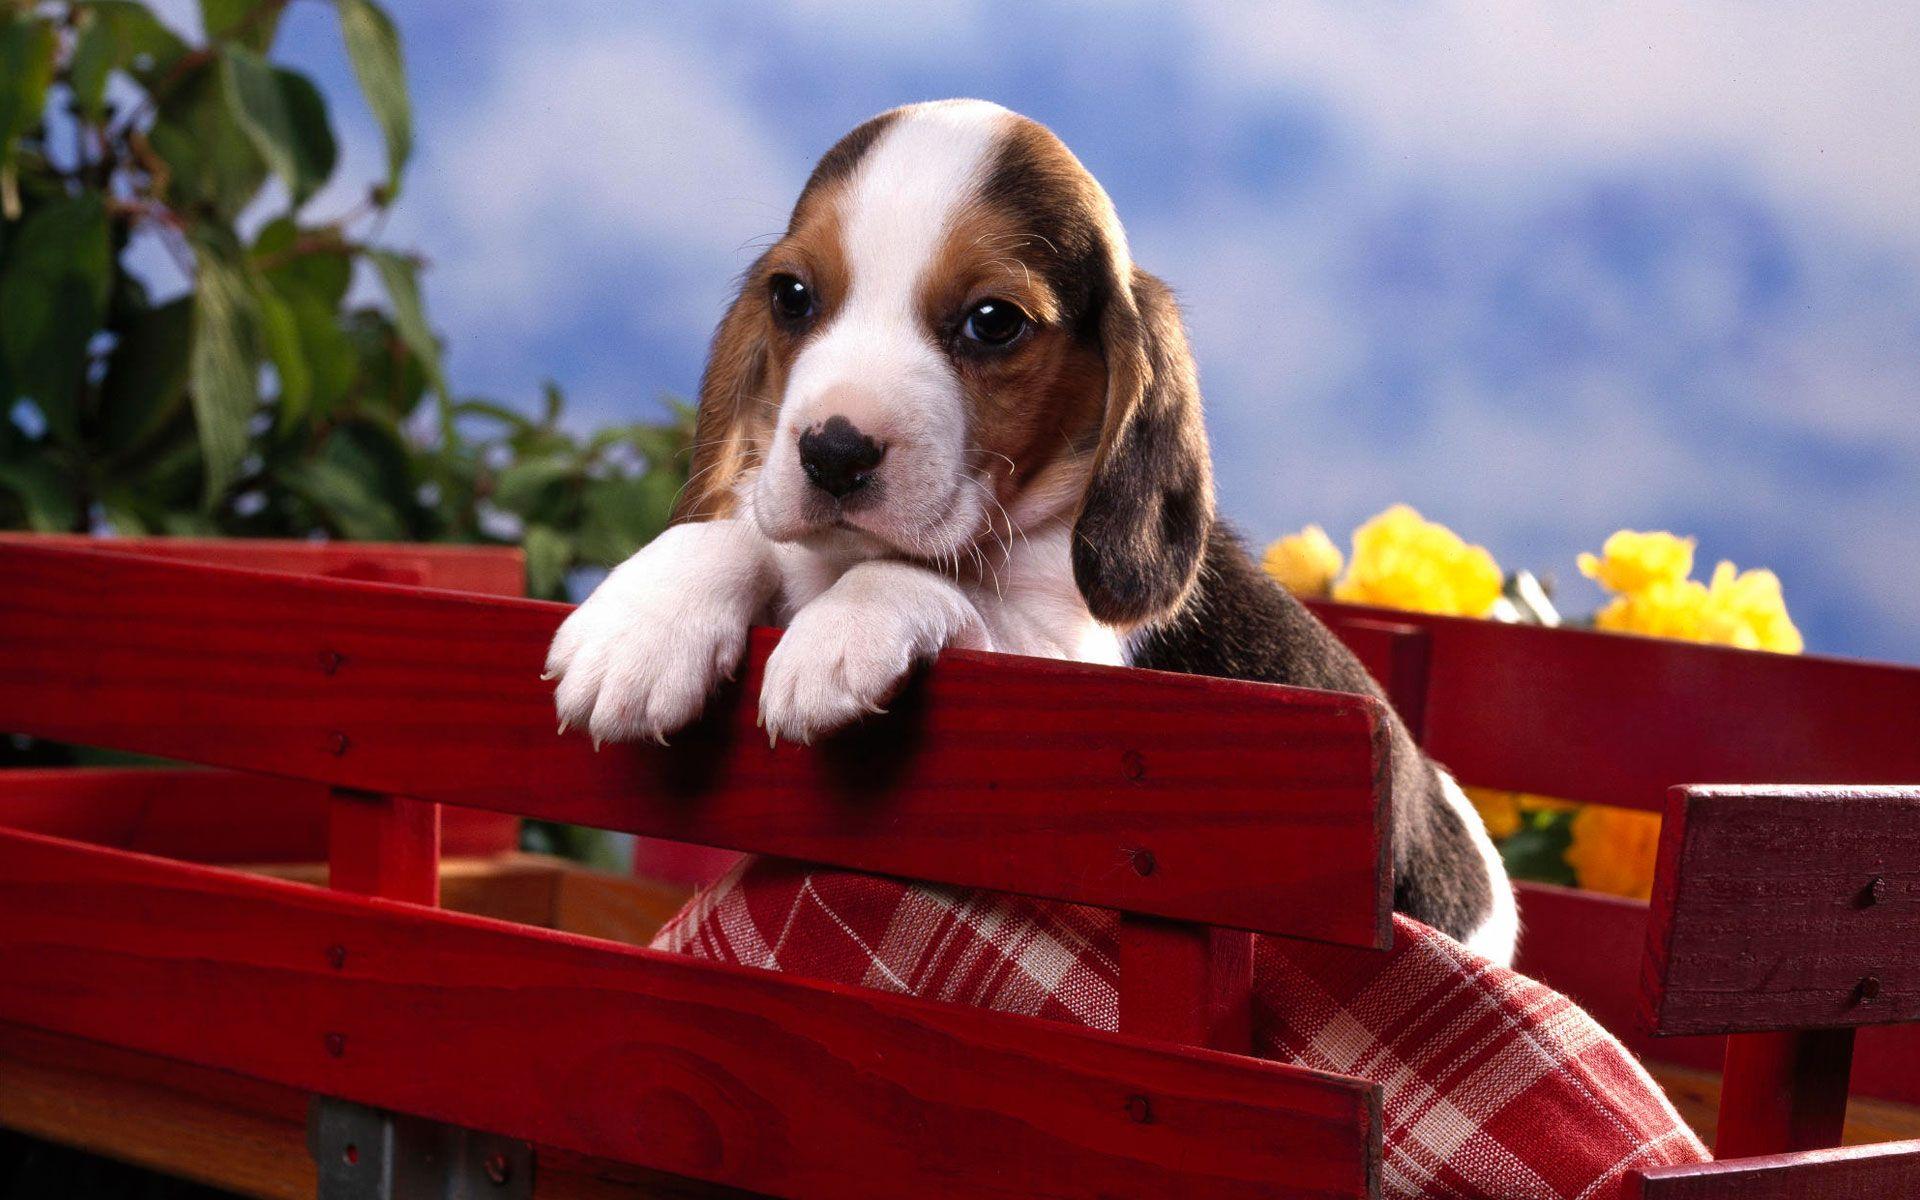 Beagle Puppy Wide Beagle Puppy Cute Beagles Beagle Dog